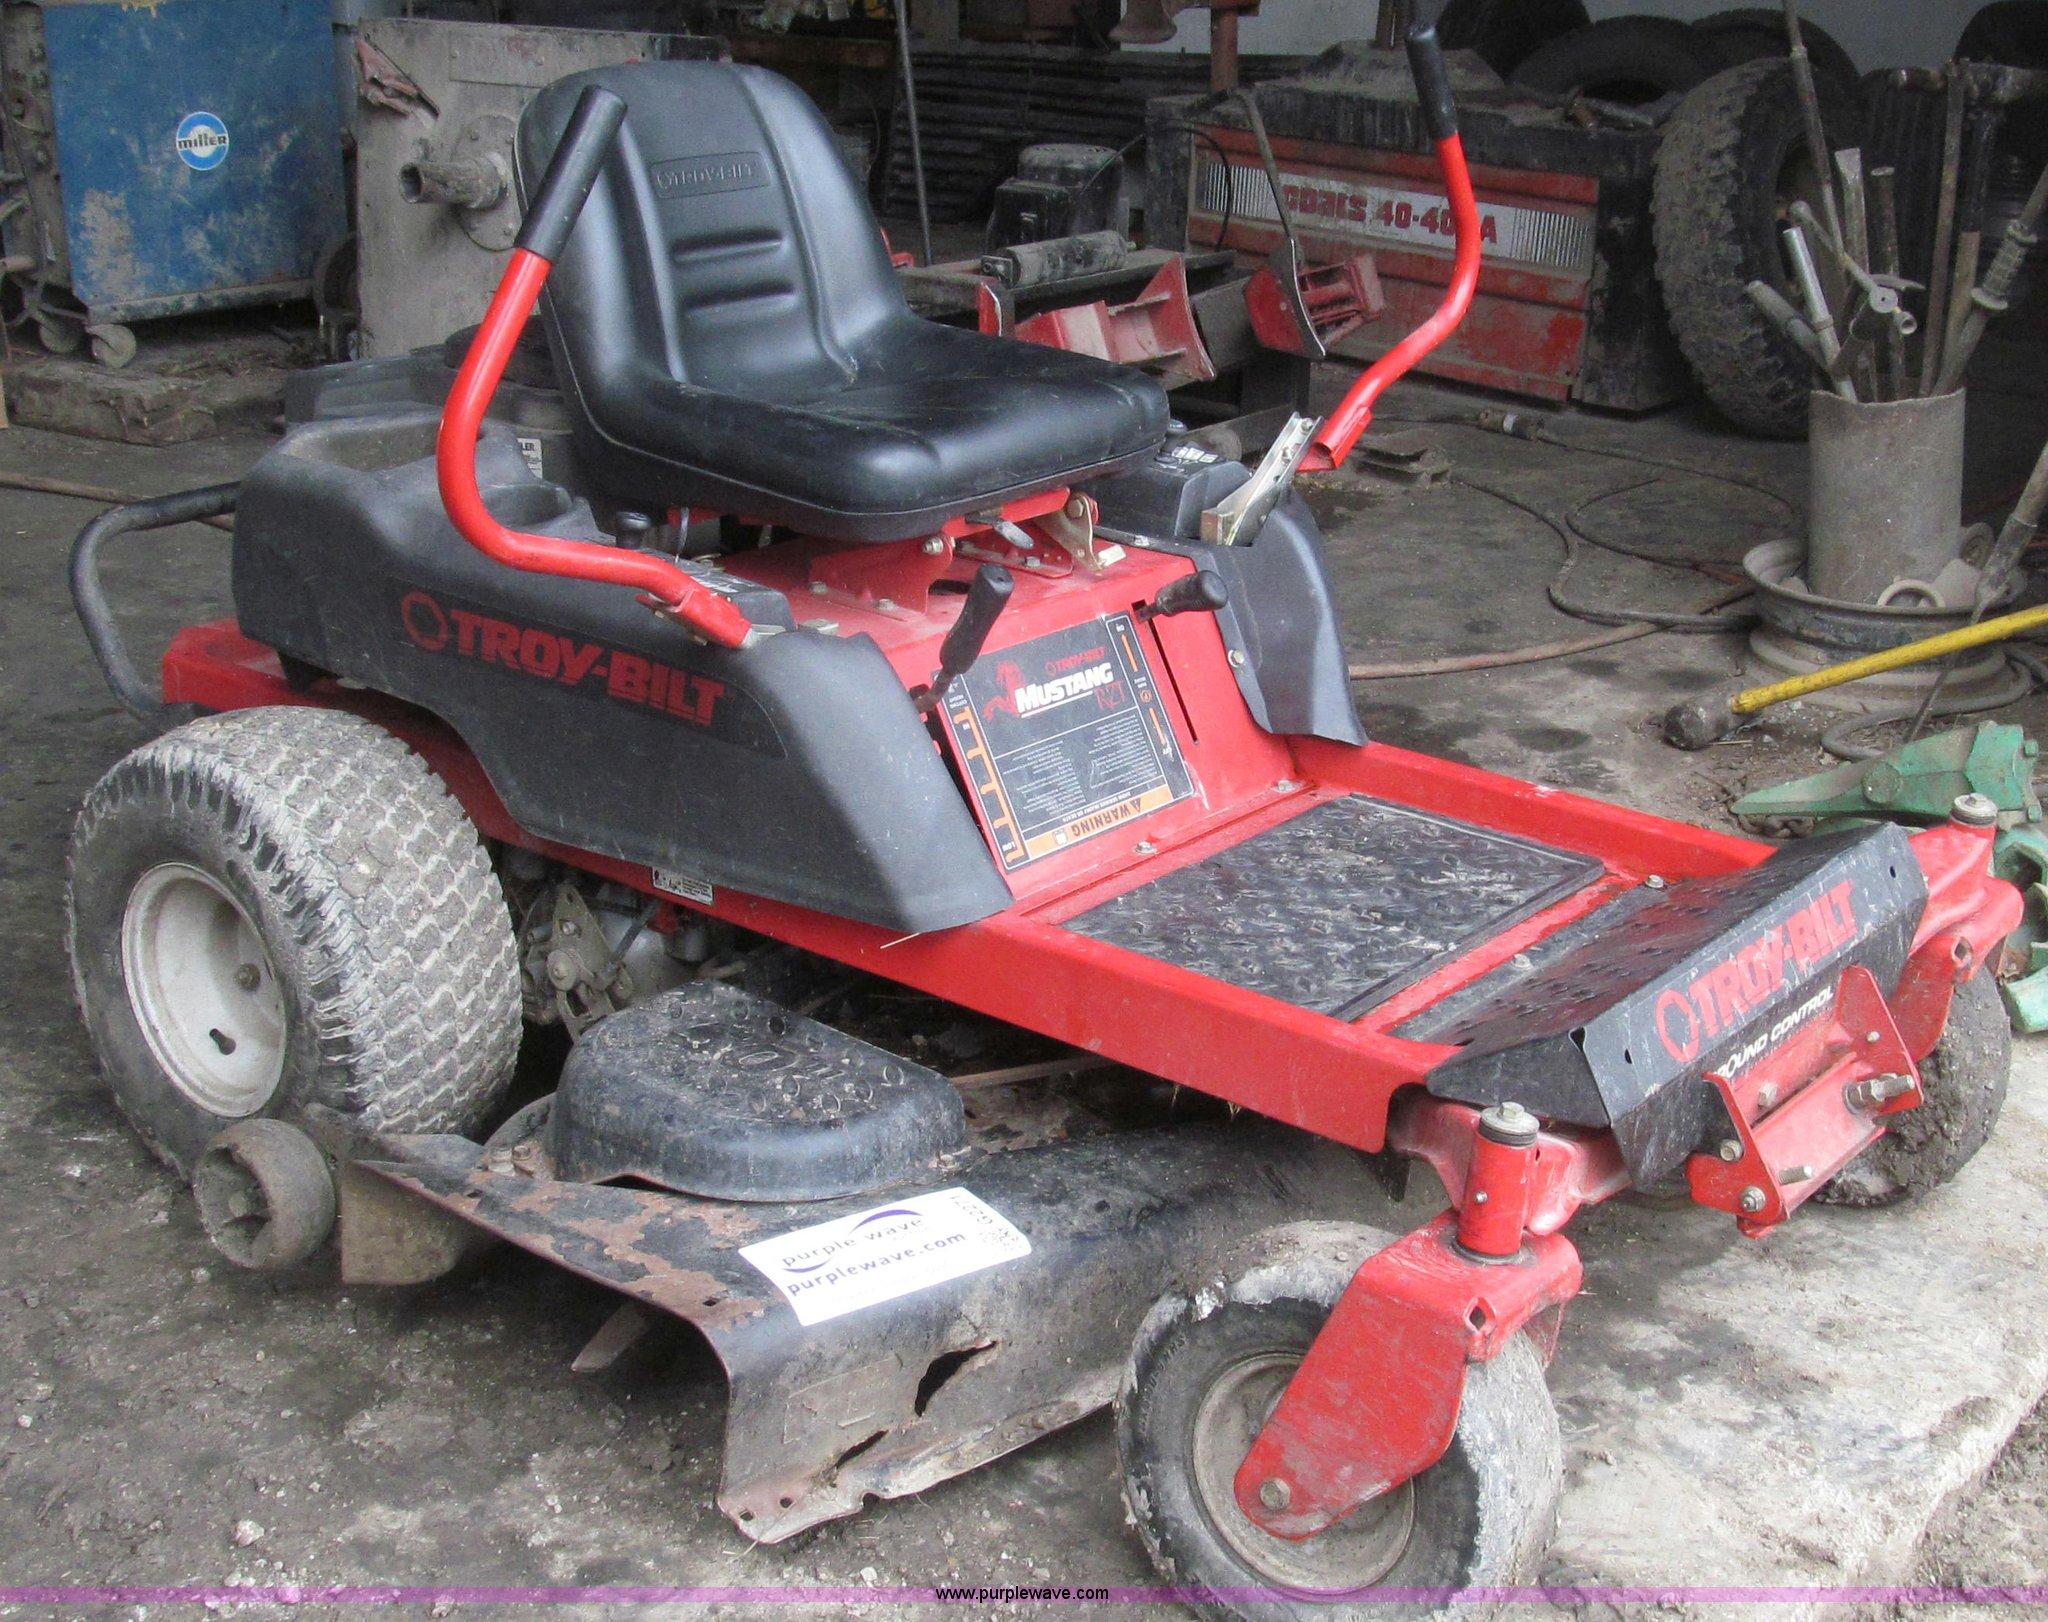 2007 Troy Bilt Mustang RZT ZTR lawn mower | Item G2271 | SOL